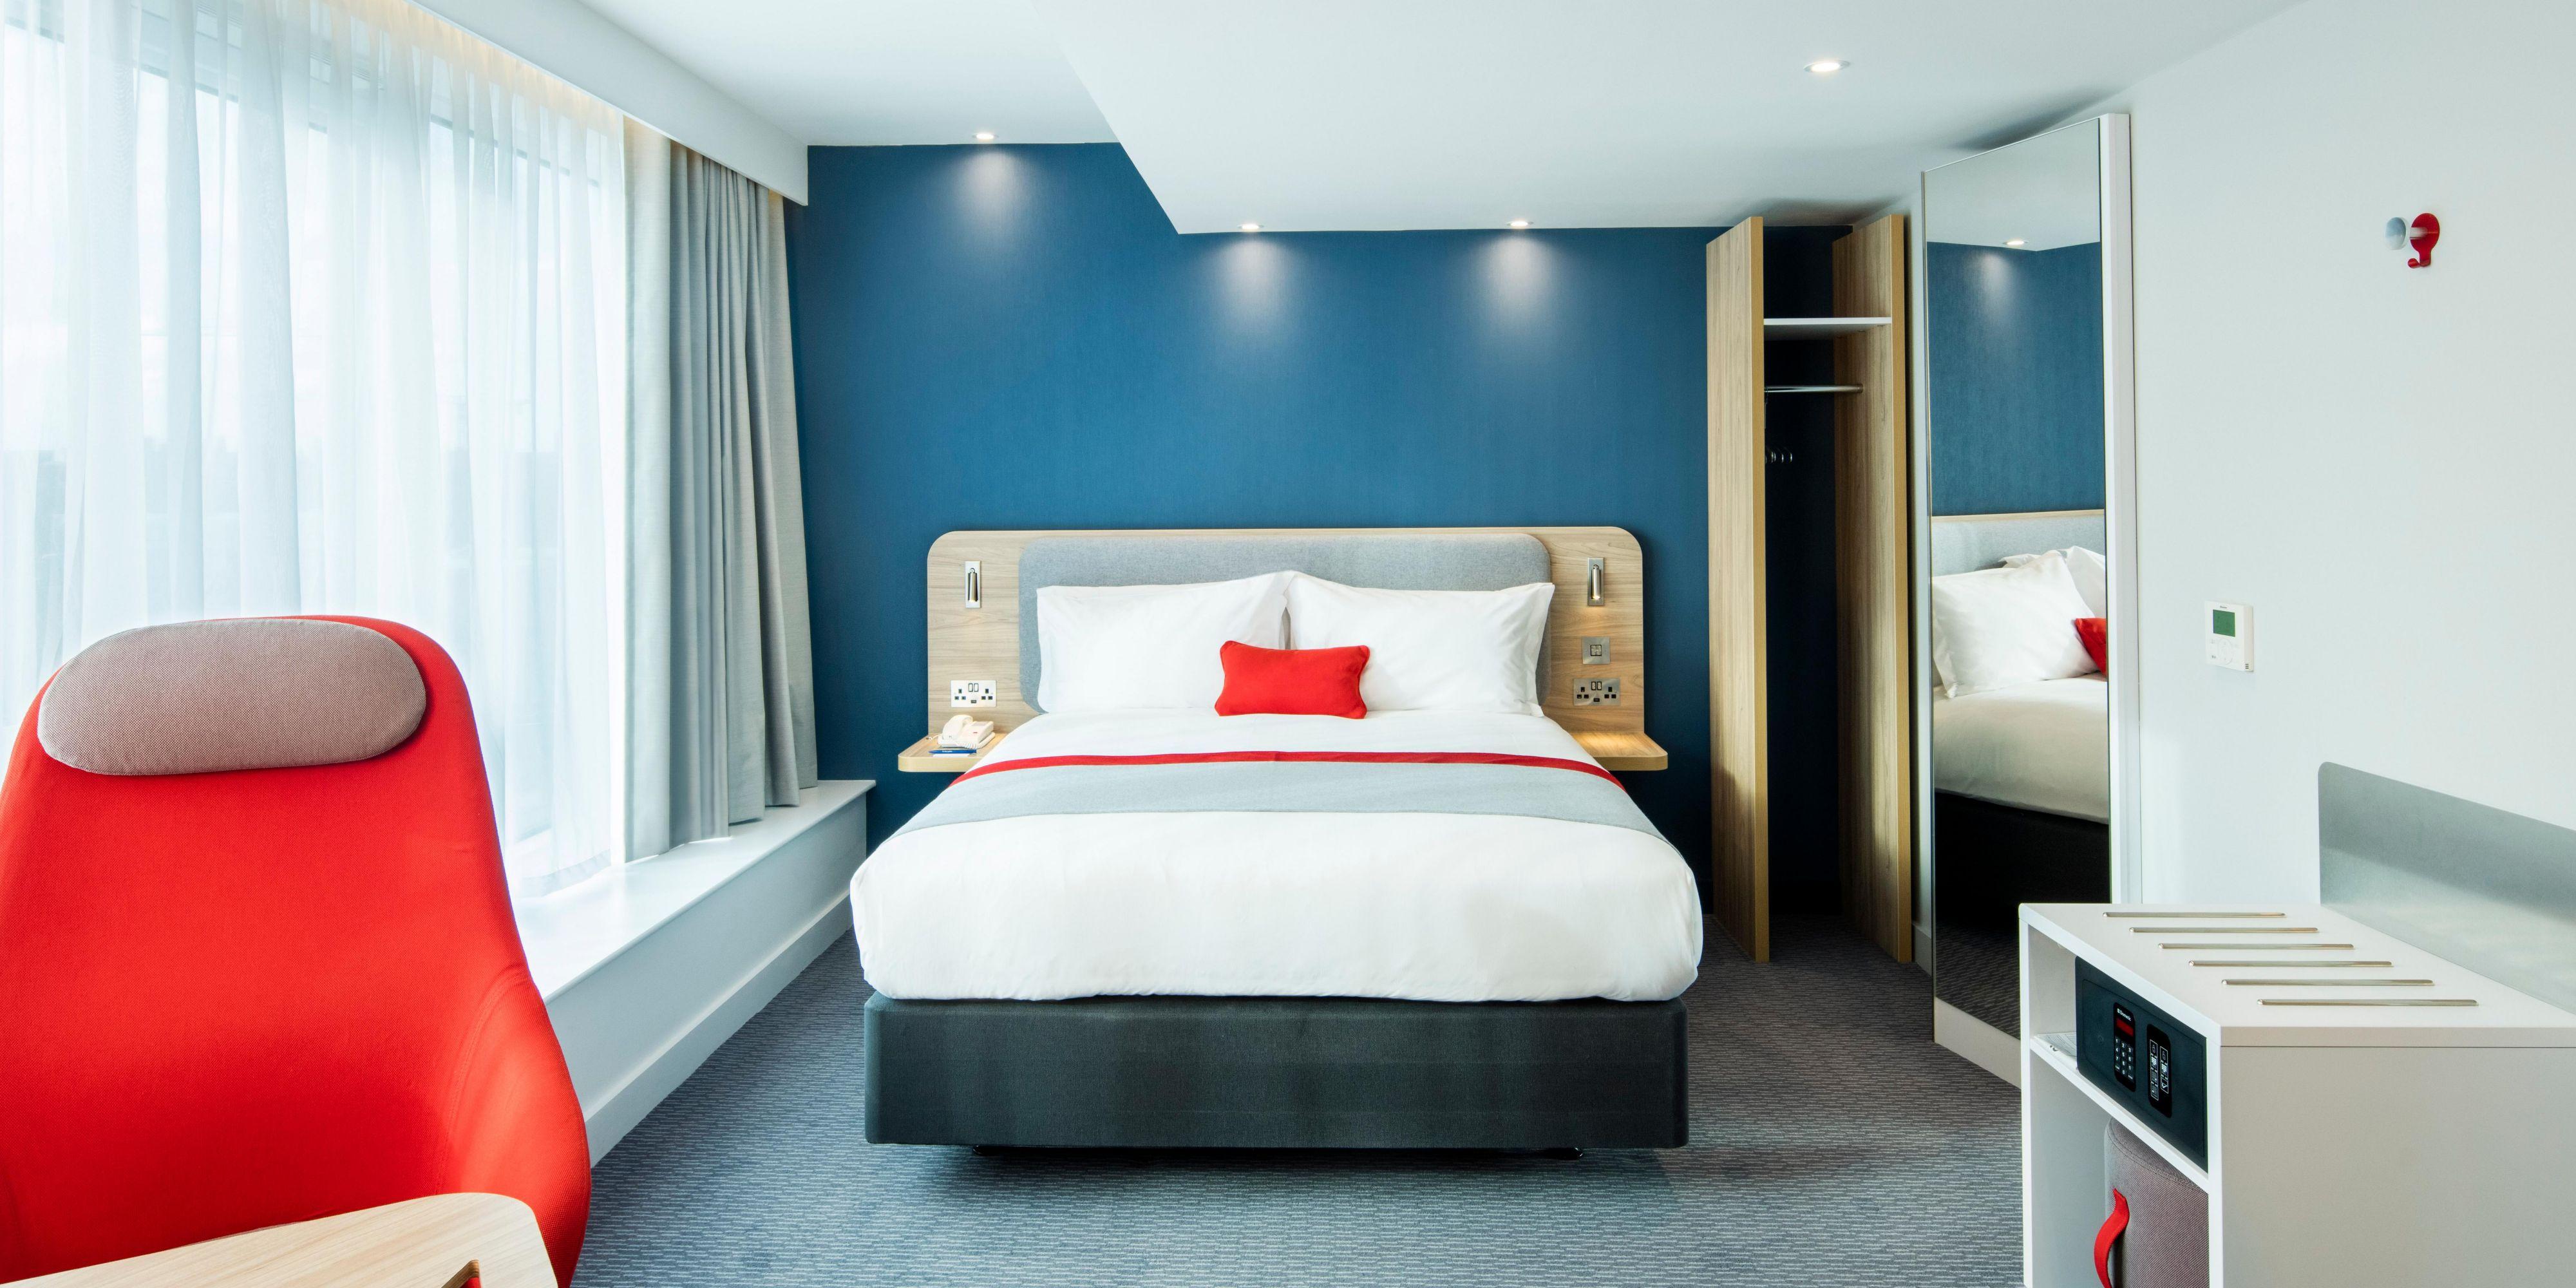 Holiday Inn Express Dublin City Centre Hotel by IHG